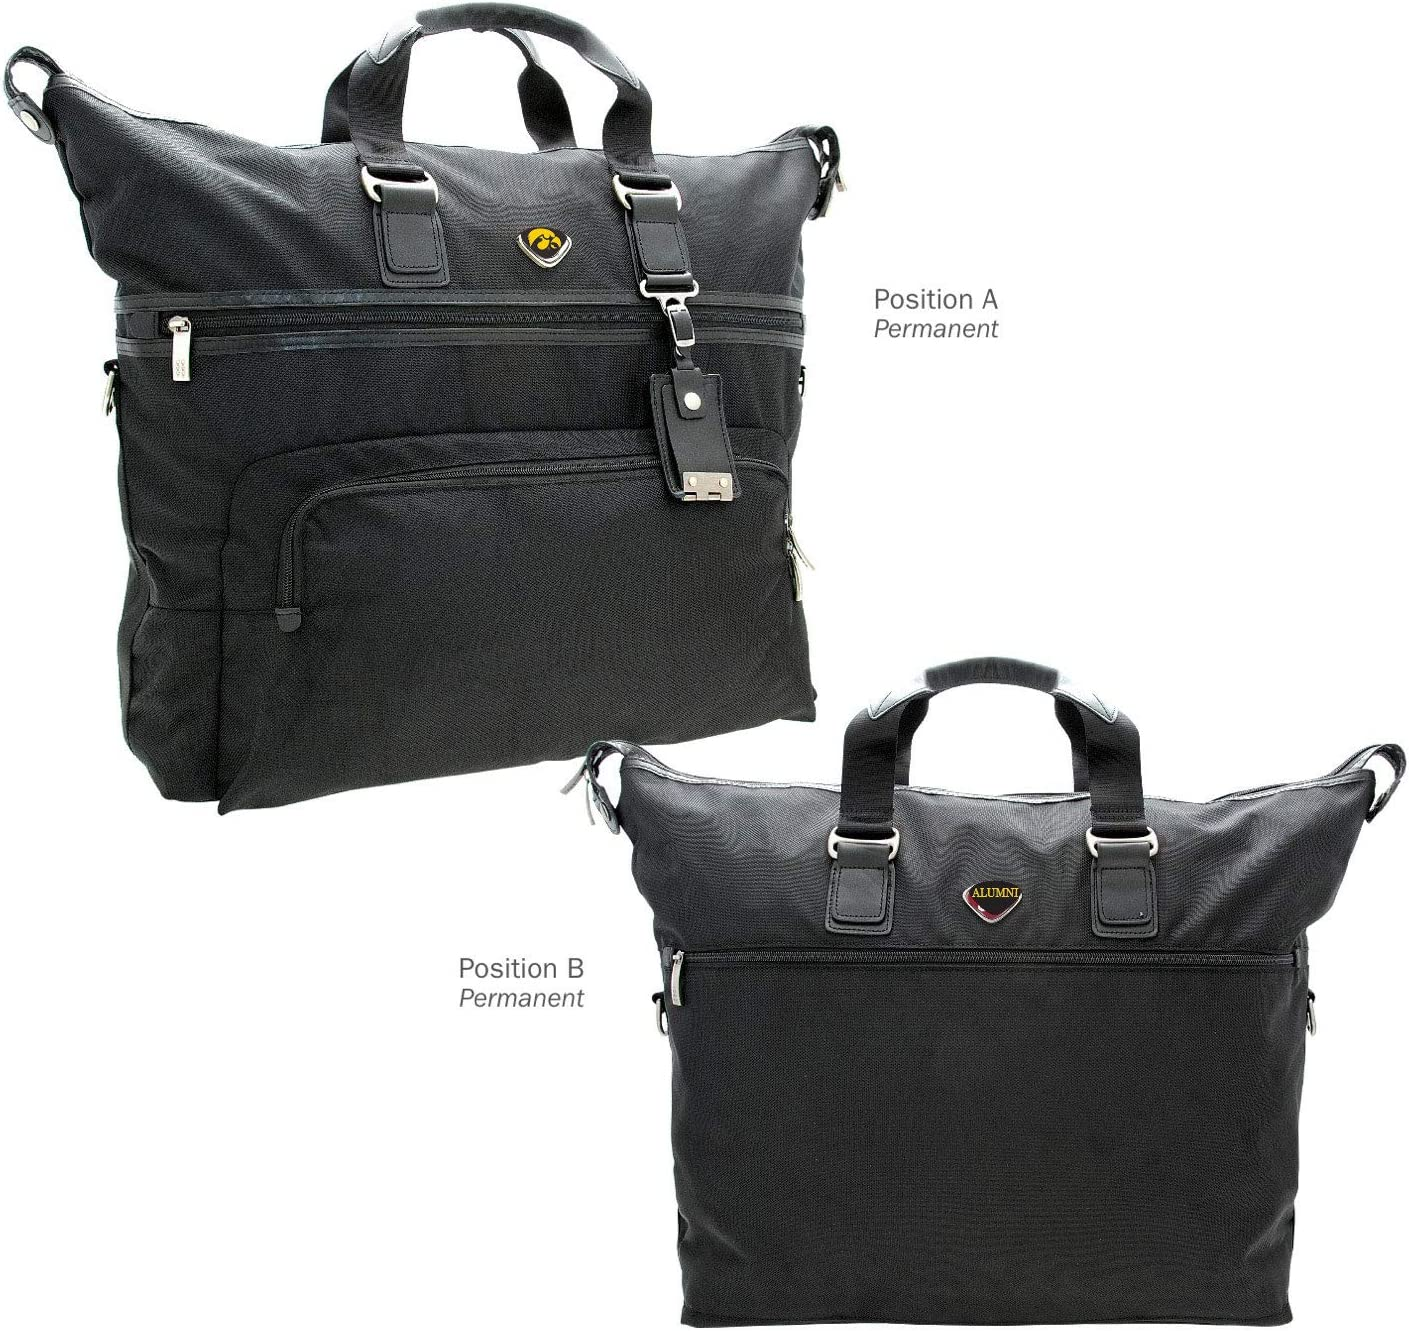 AdSpec NCAA Iowa Hawkeyes Collegiate Executive Weekender Duffel BagCollegiate Executive Weekender Duffel Bag Black One Size